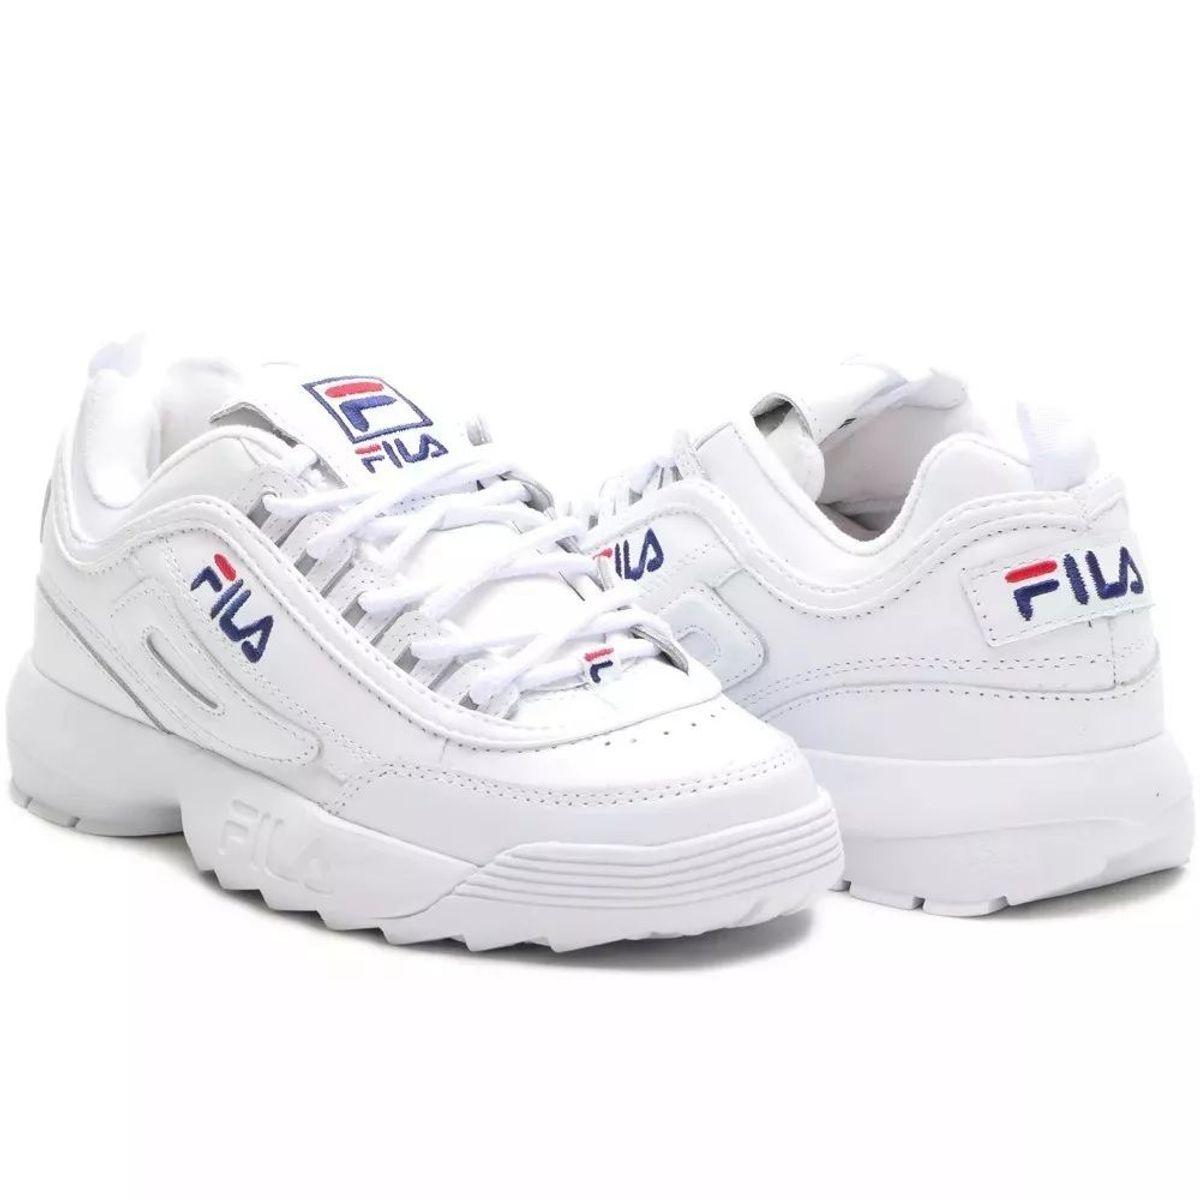 51daa913a9 Tênis Fila Feminino Sneaker Disruptor Branco Branco Nº 38